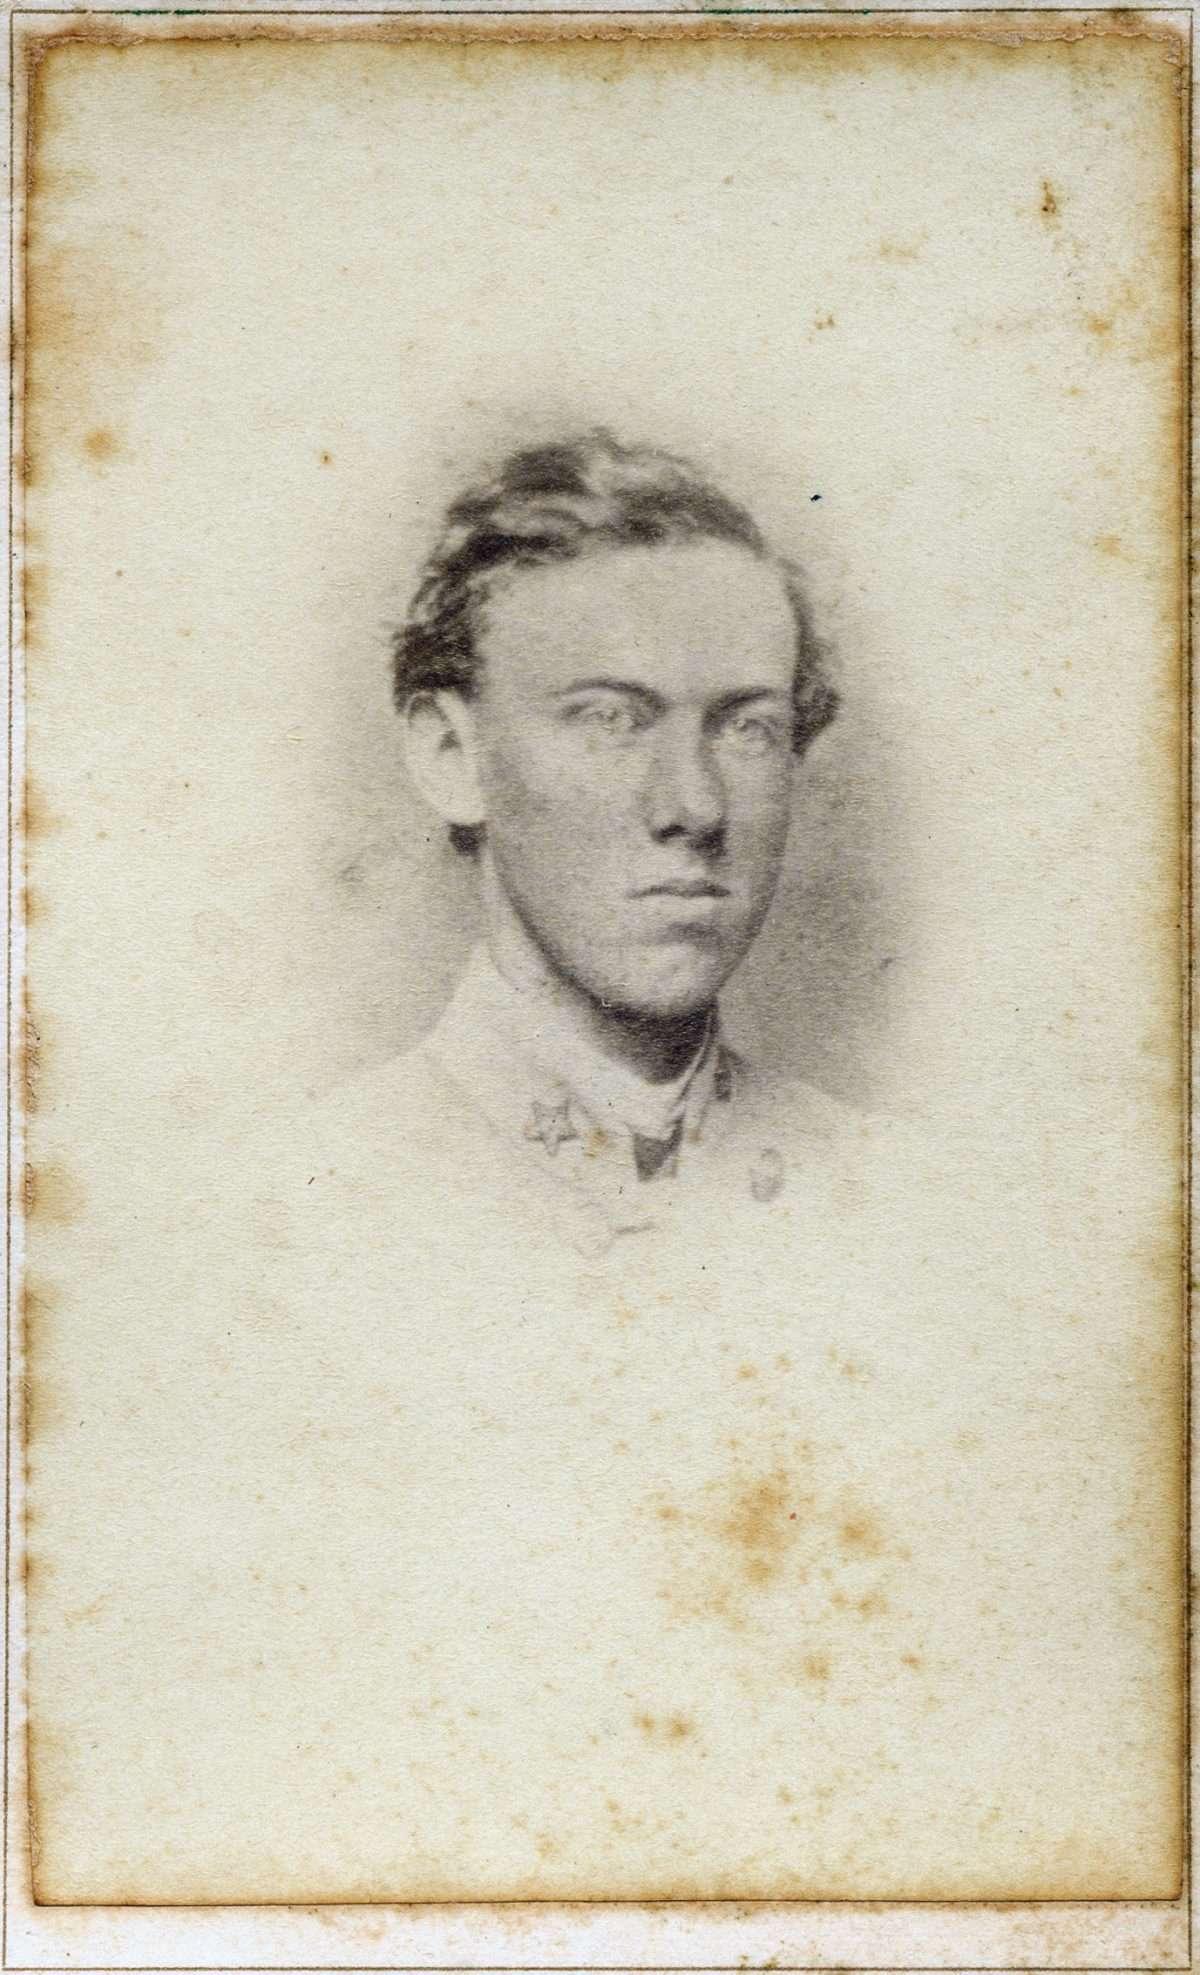 Alexander Swift Pendleton